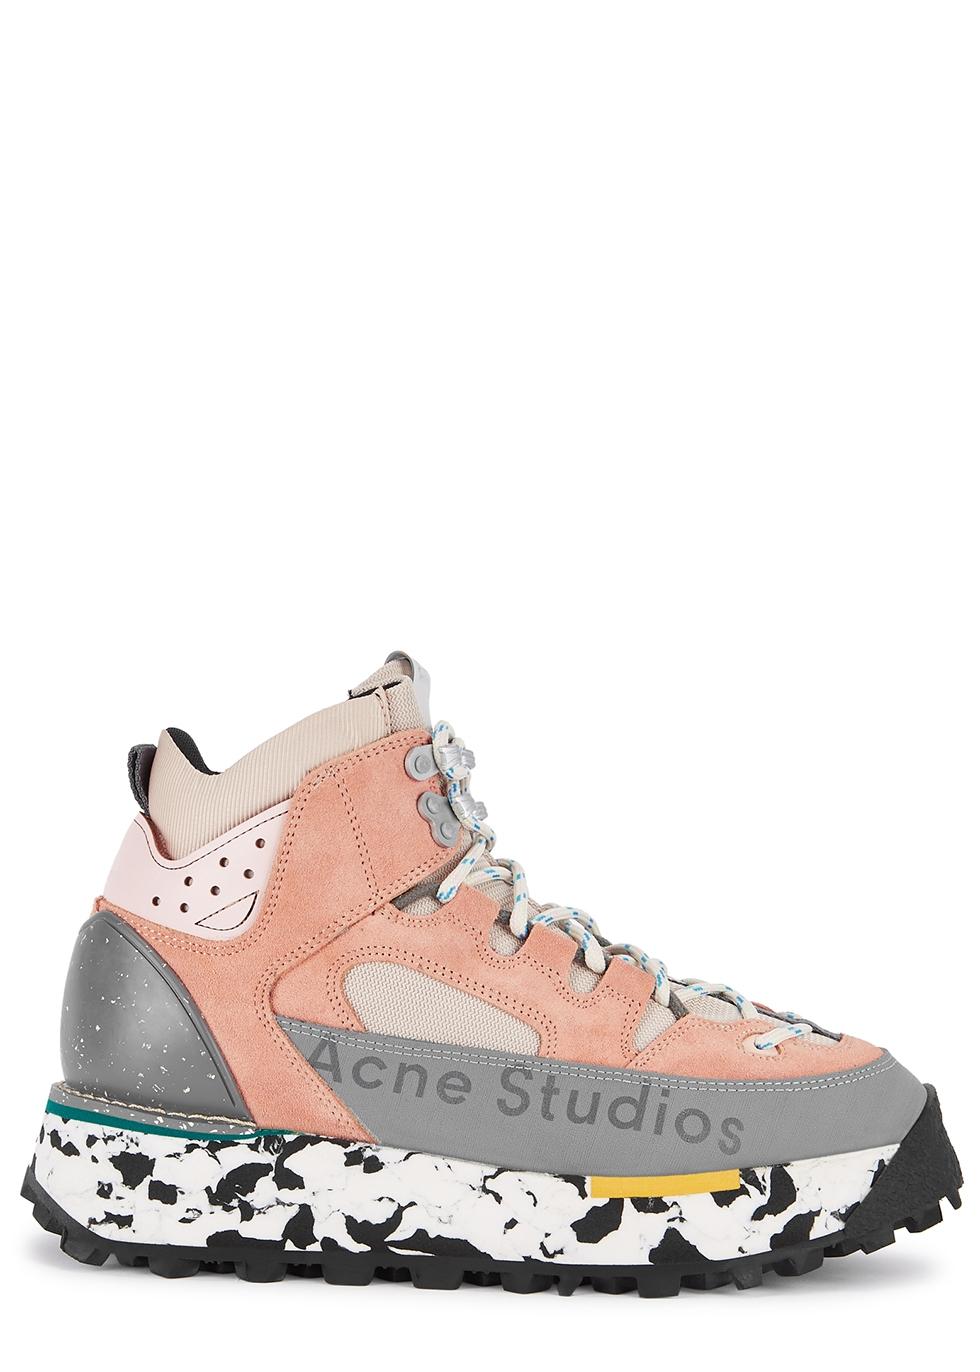 Air Outdoor Sneakersbuy Get Running One Sport 10Off